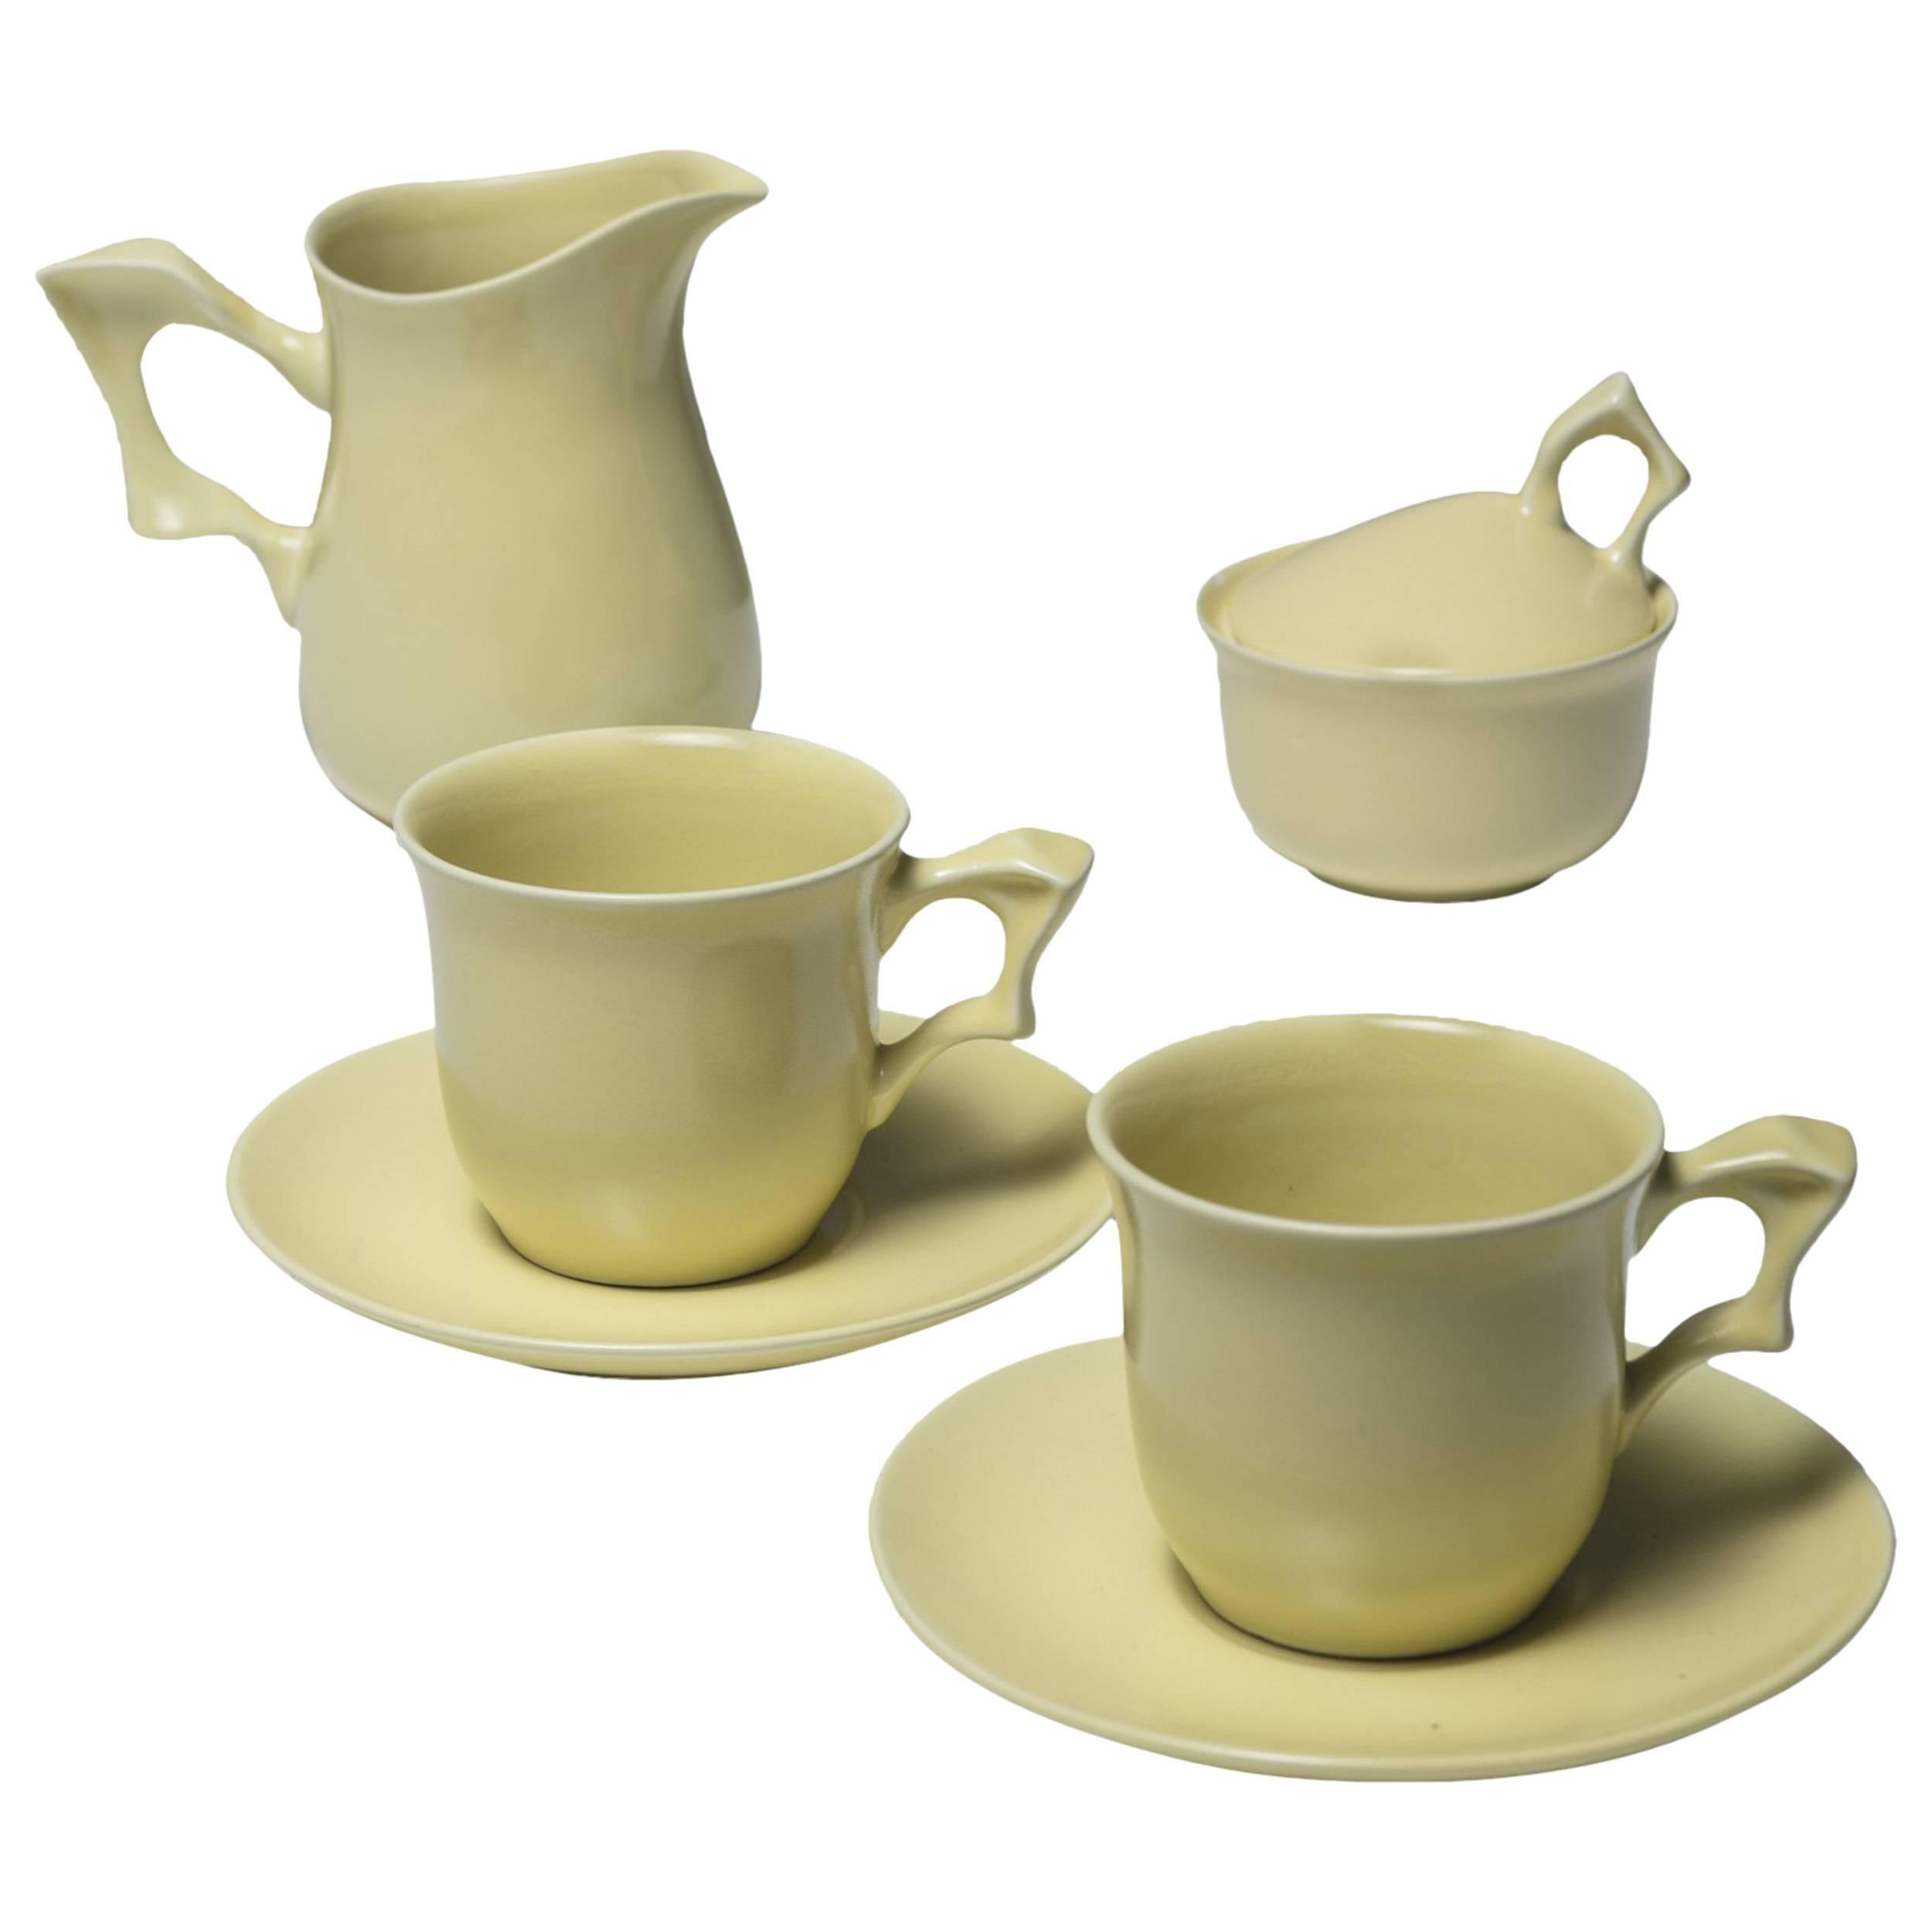 Ceramic Set by Antonia Campi for SCI Laveno